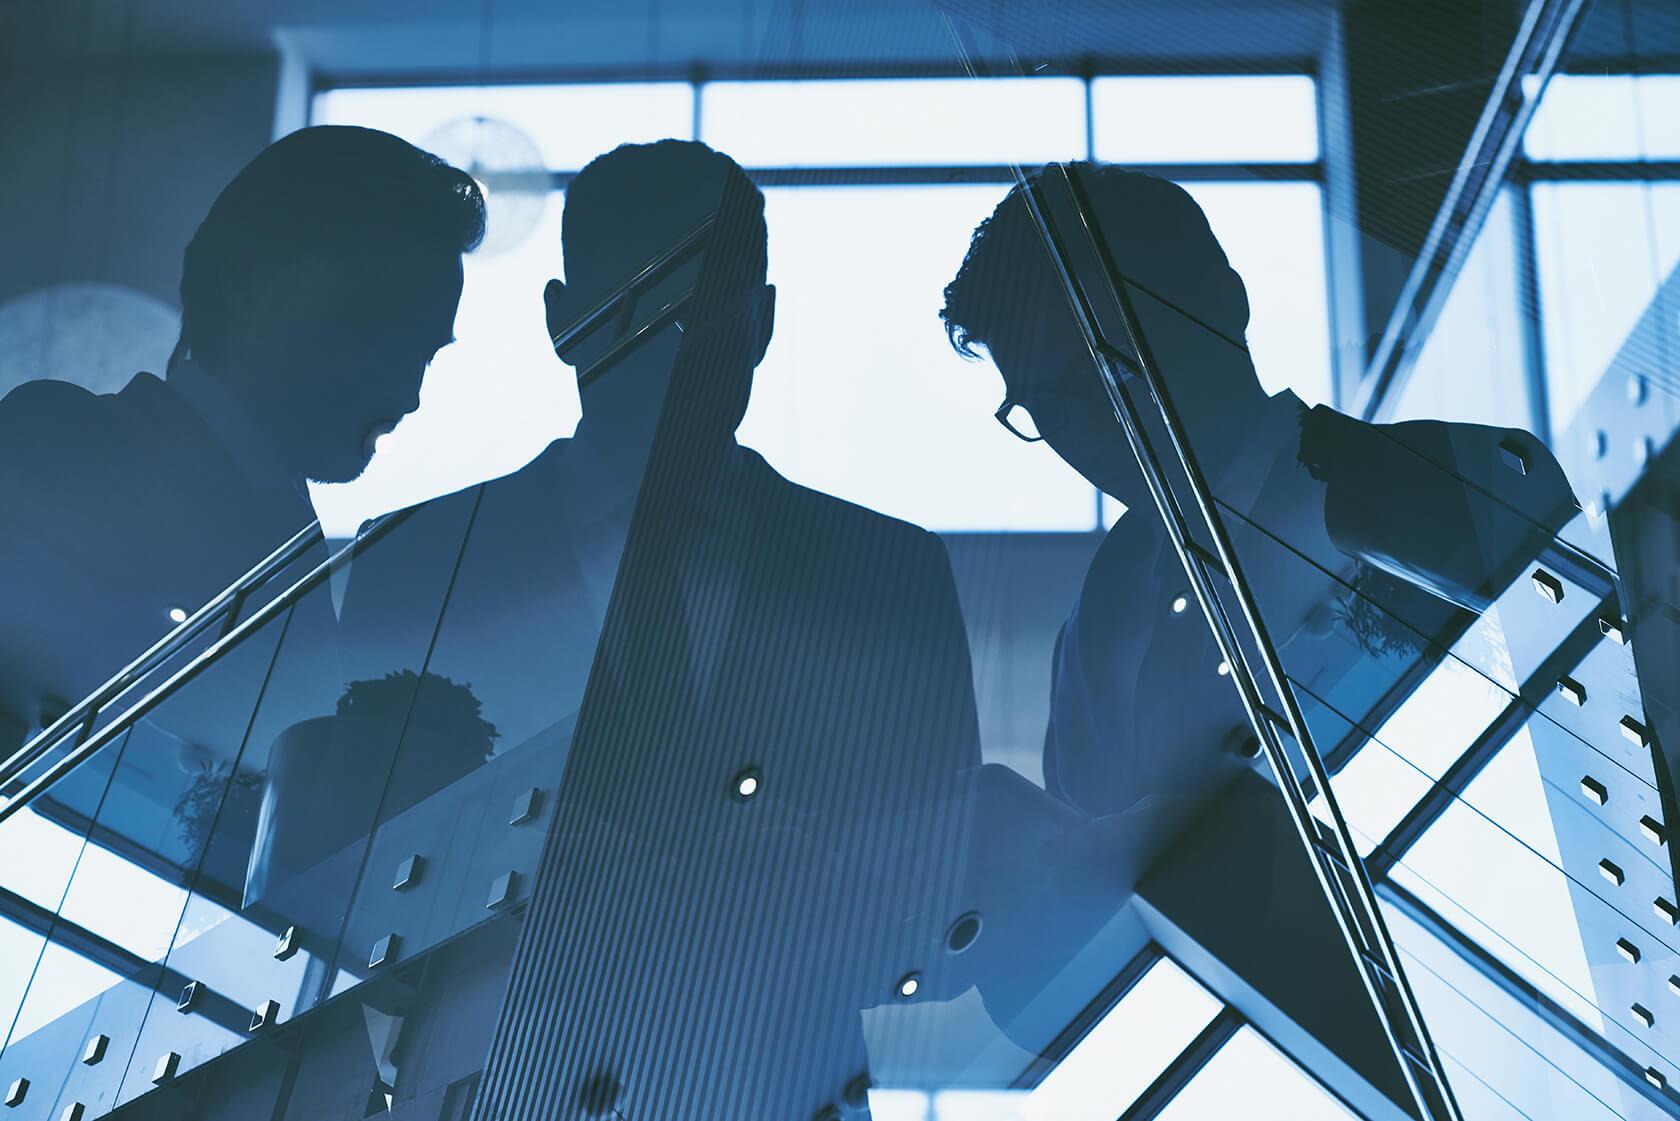 reflection of three men